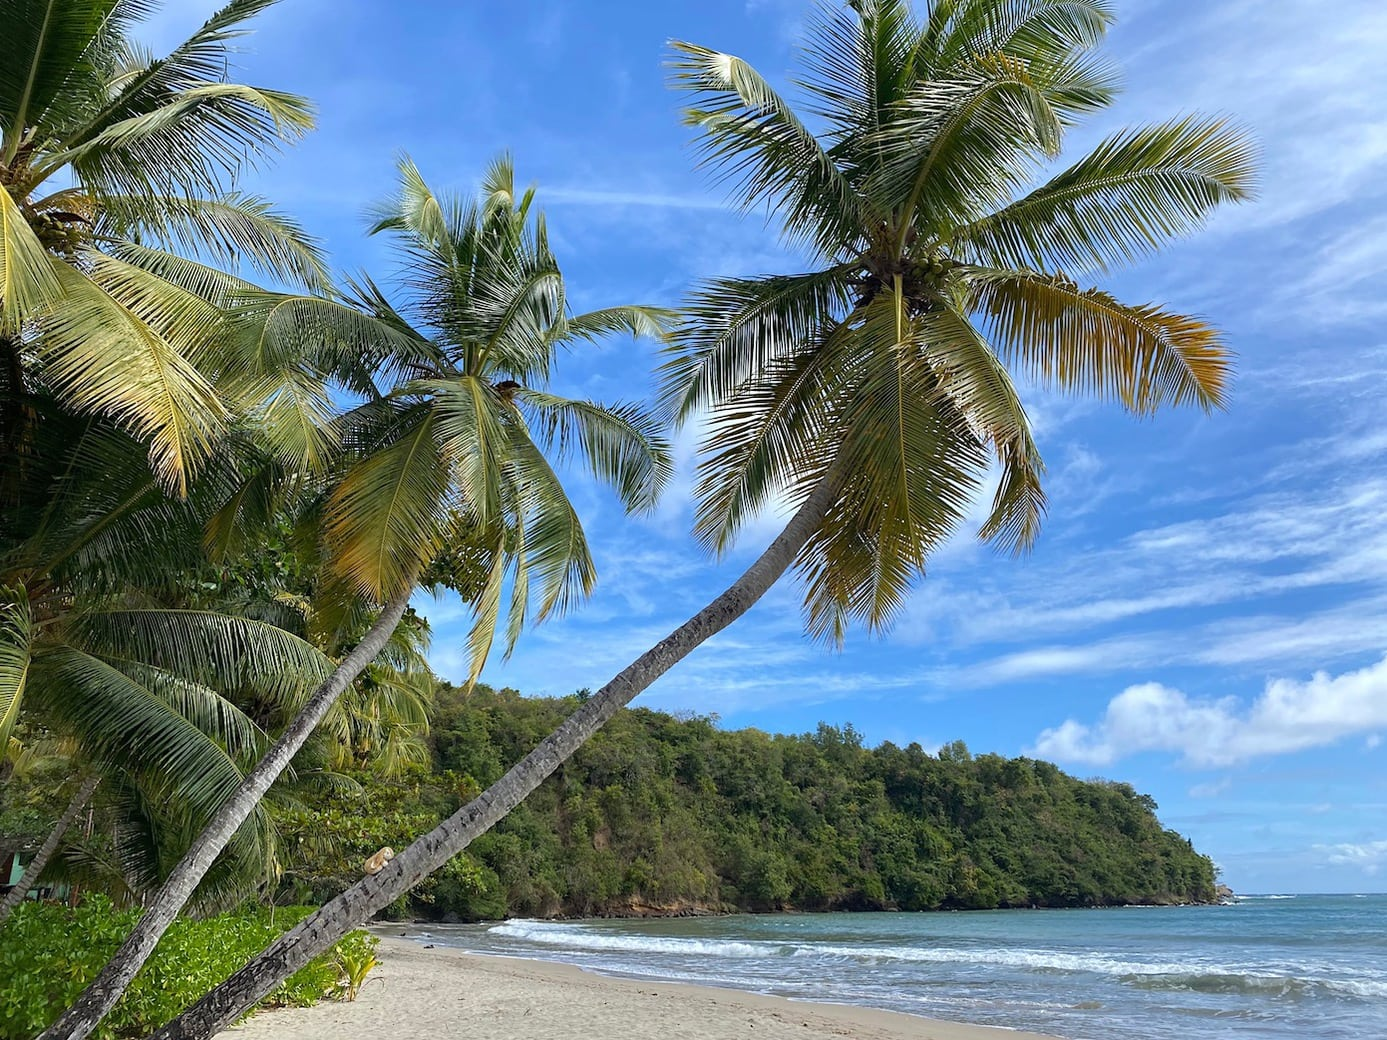 Palm-fringed beach in Grenada